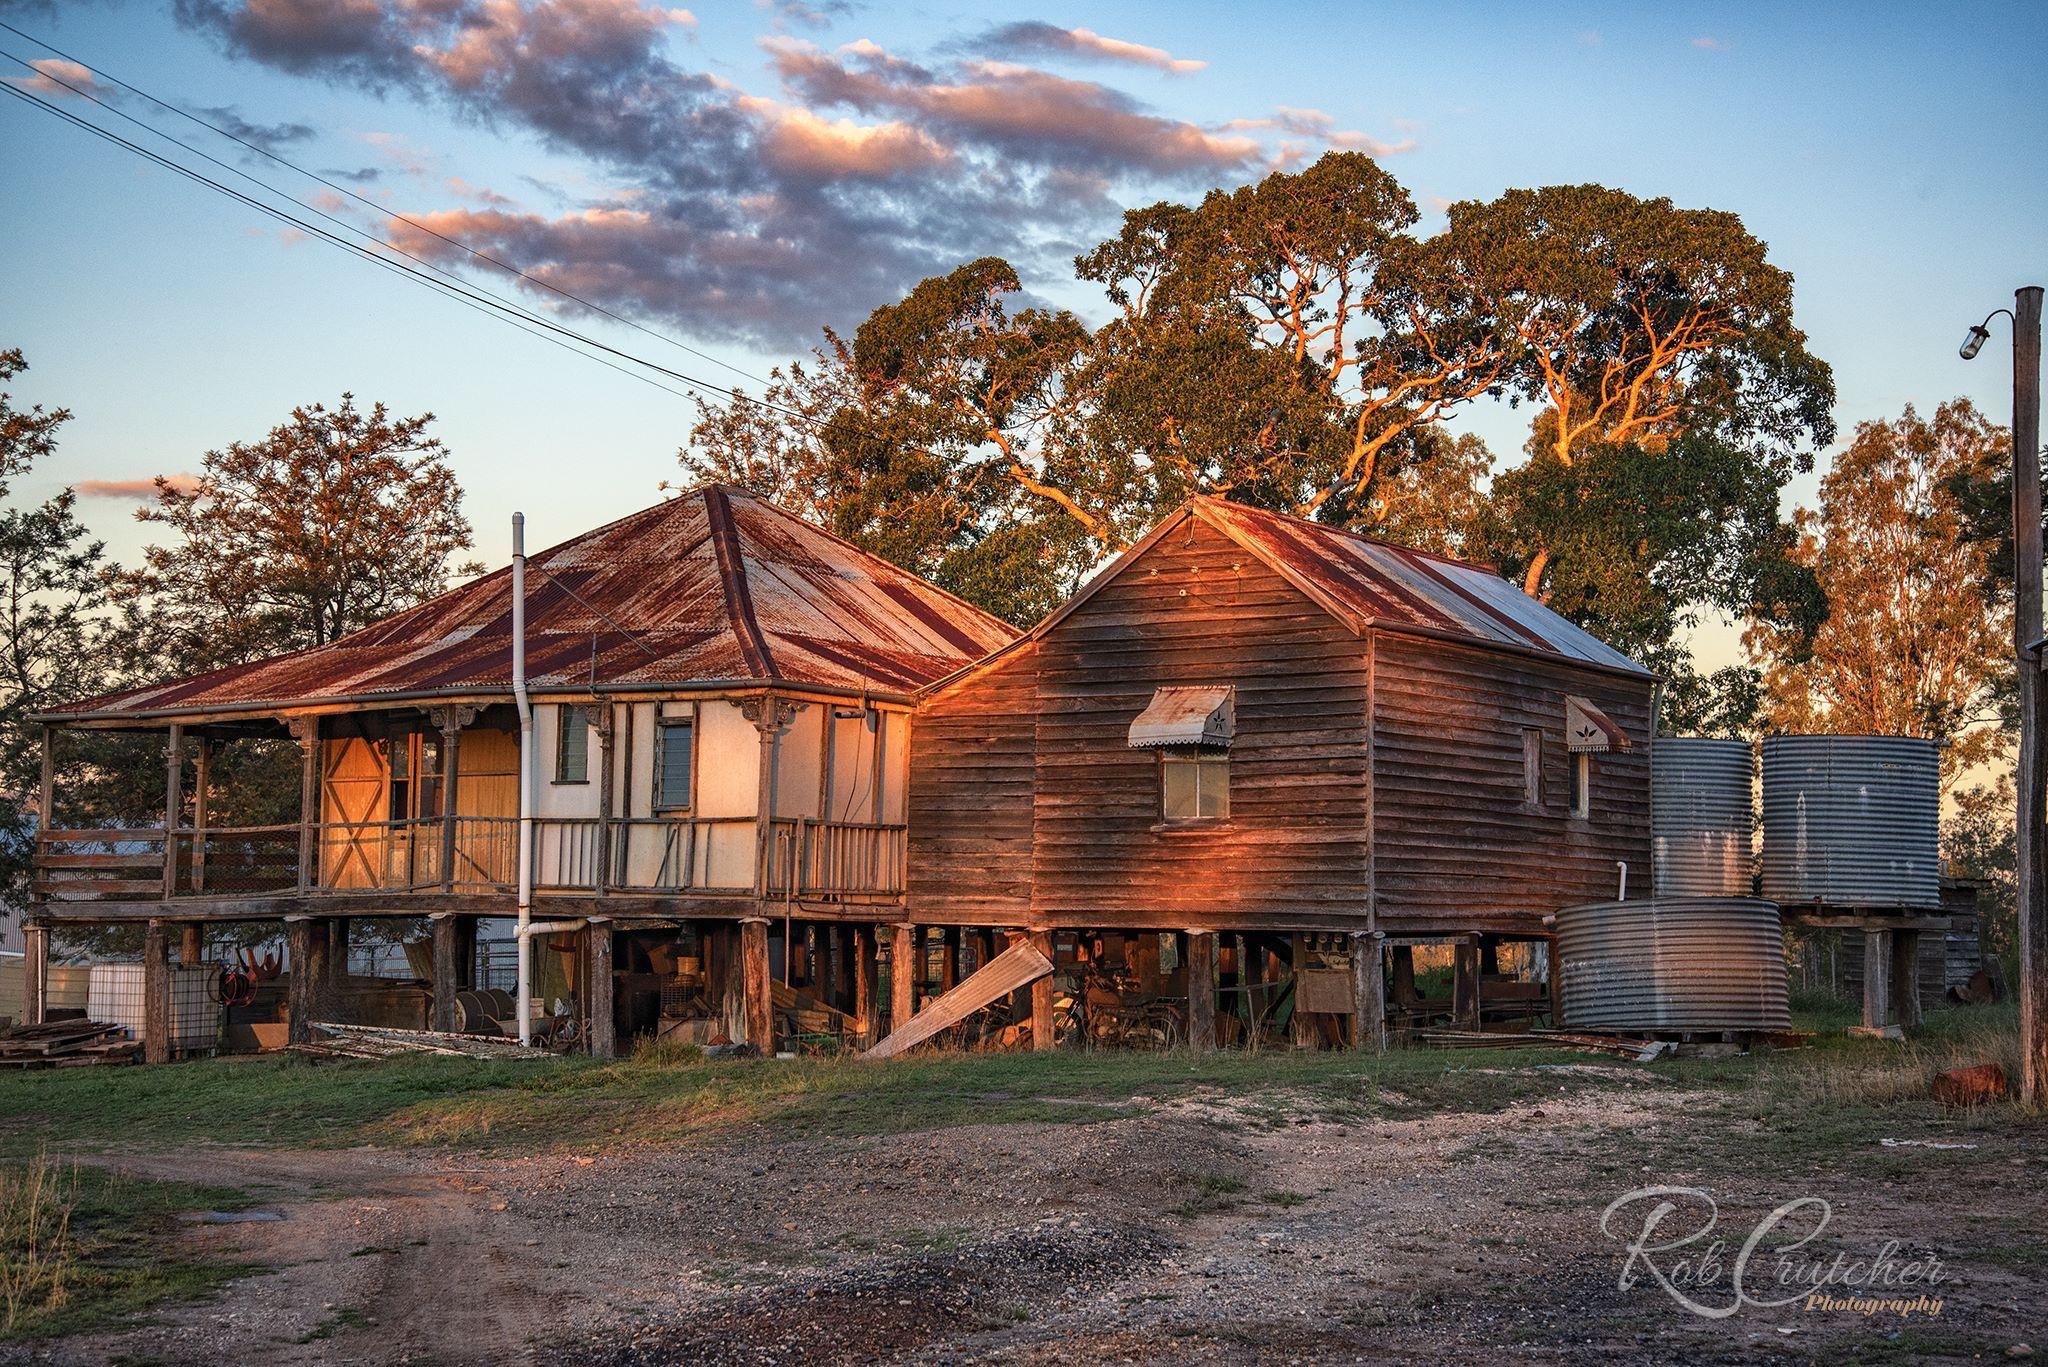 Abandoned farm house, Somerset Region, S E Queensland